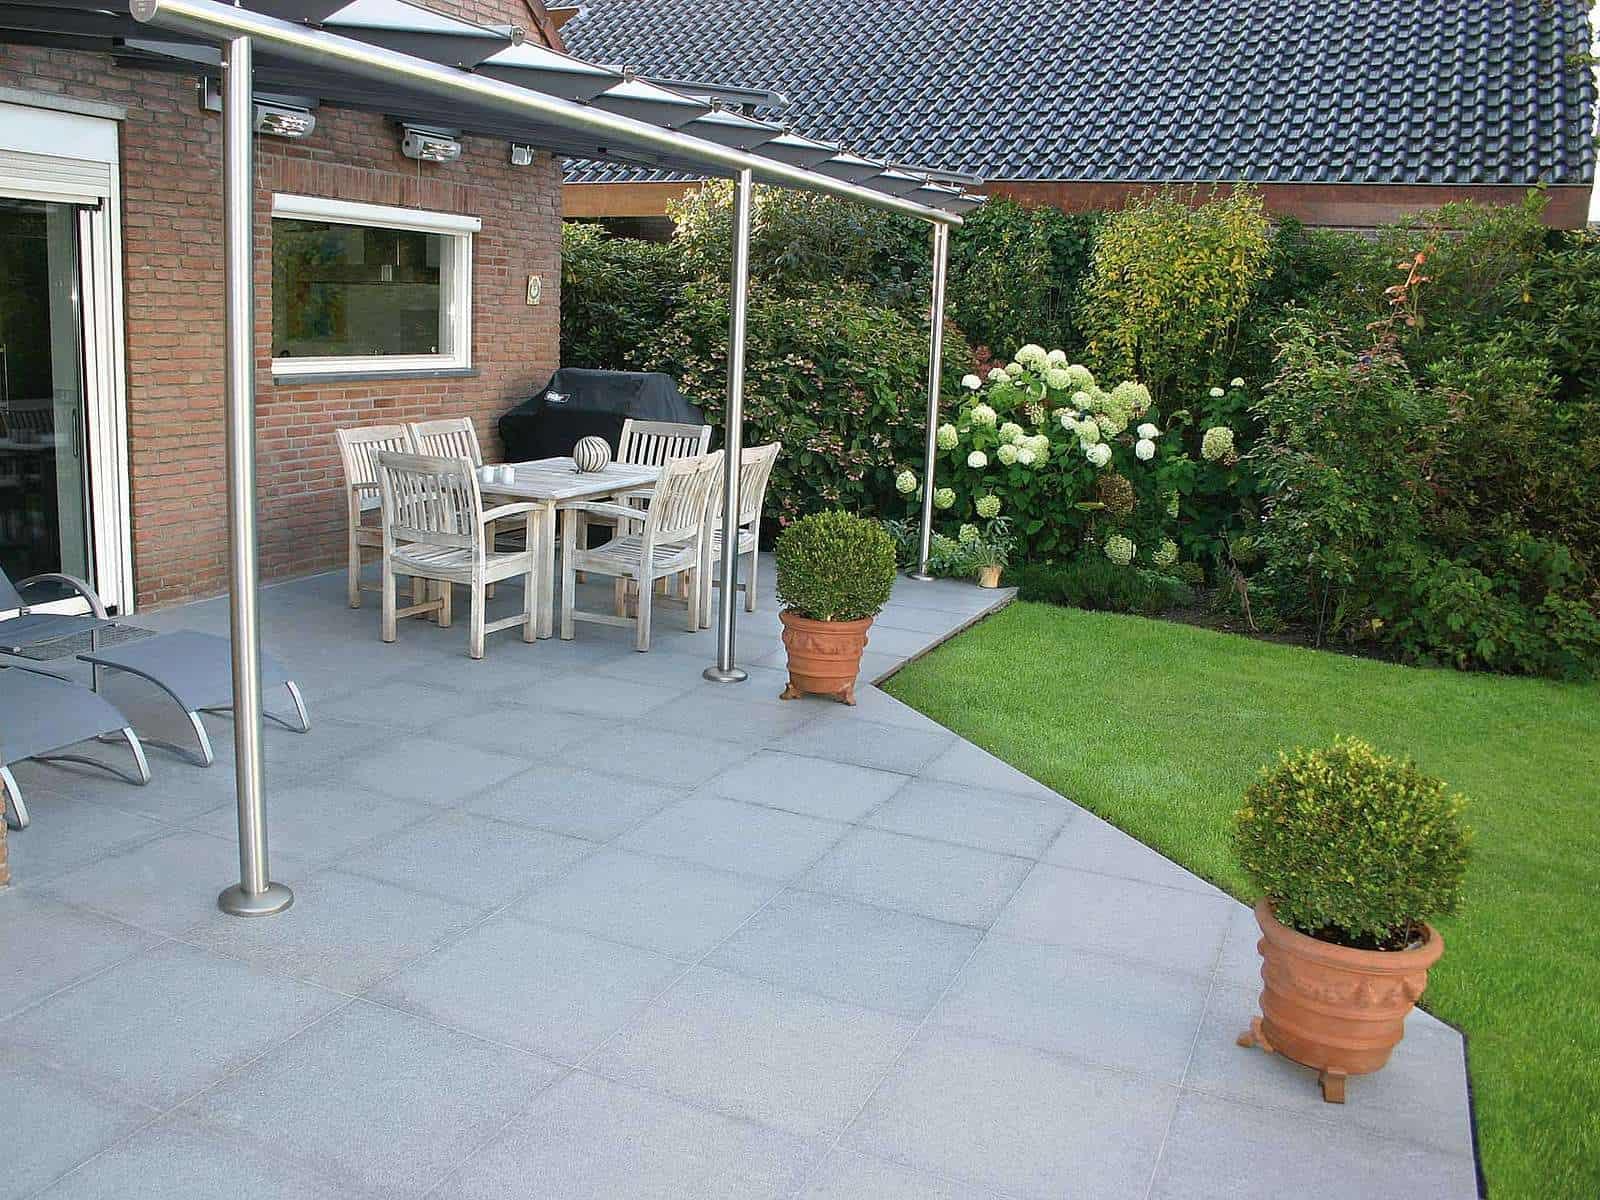 Terrasse mit grauen Granitplatten